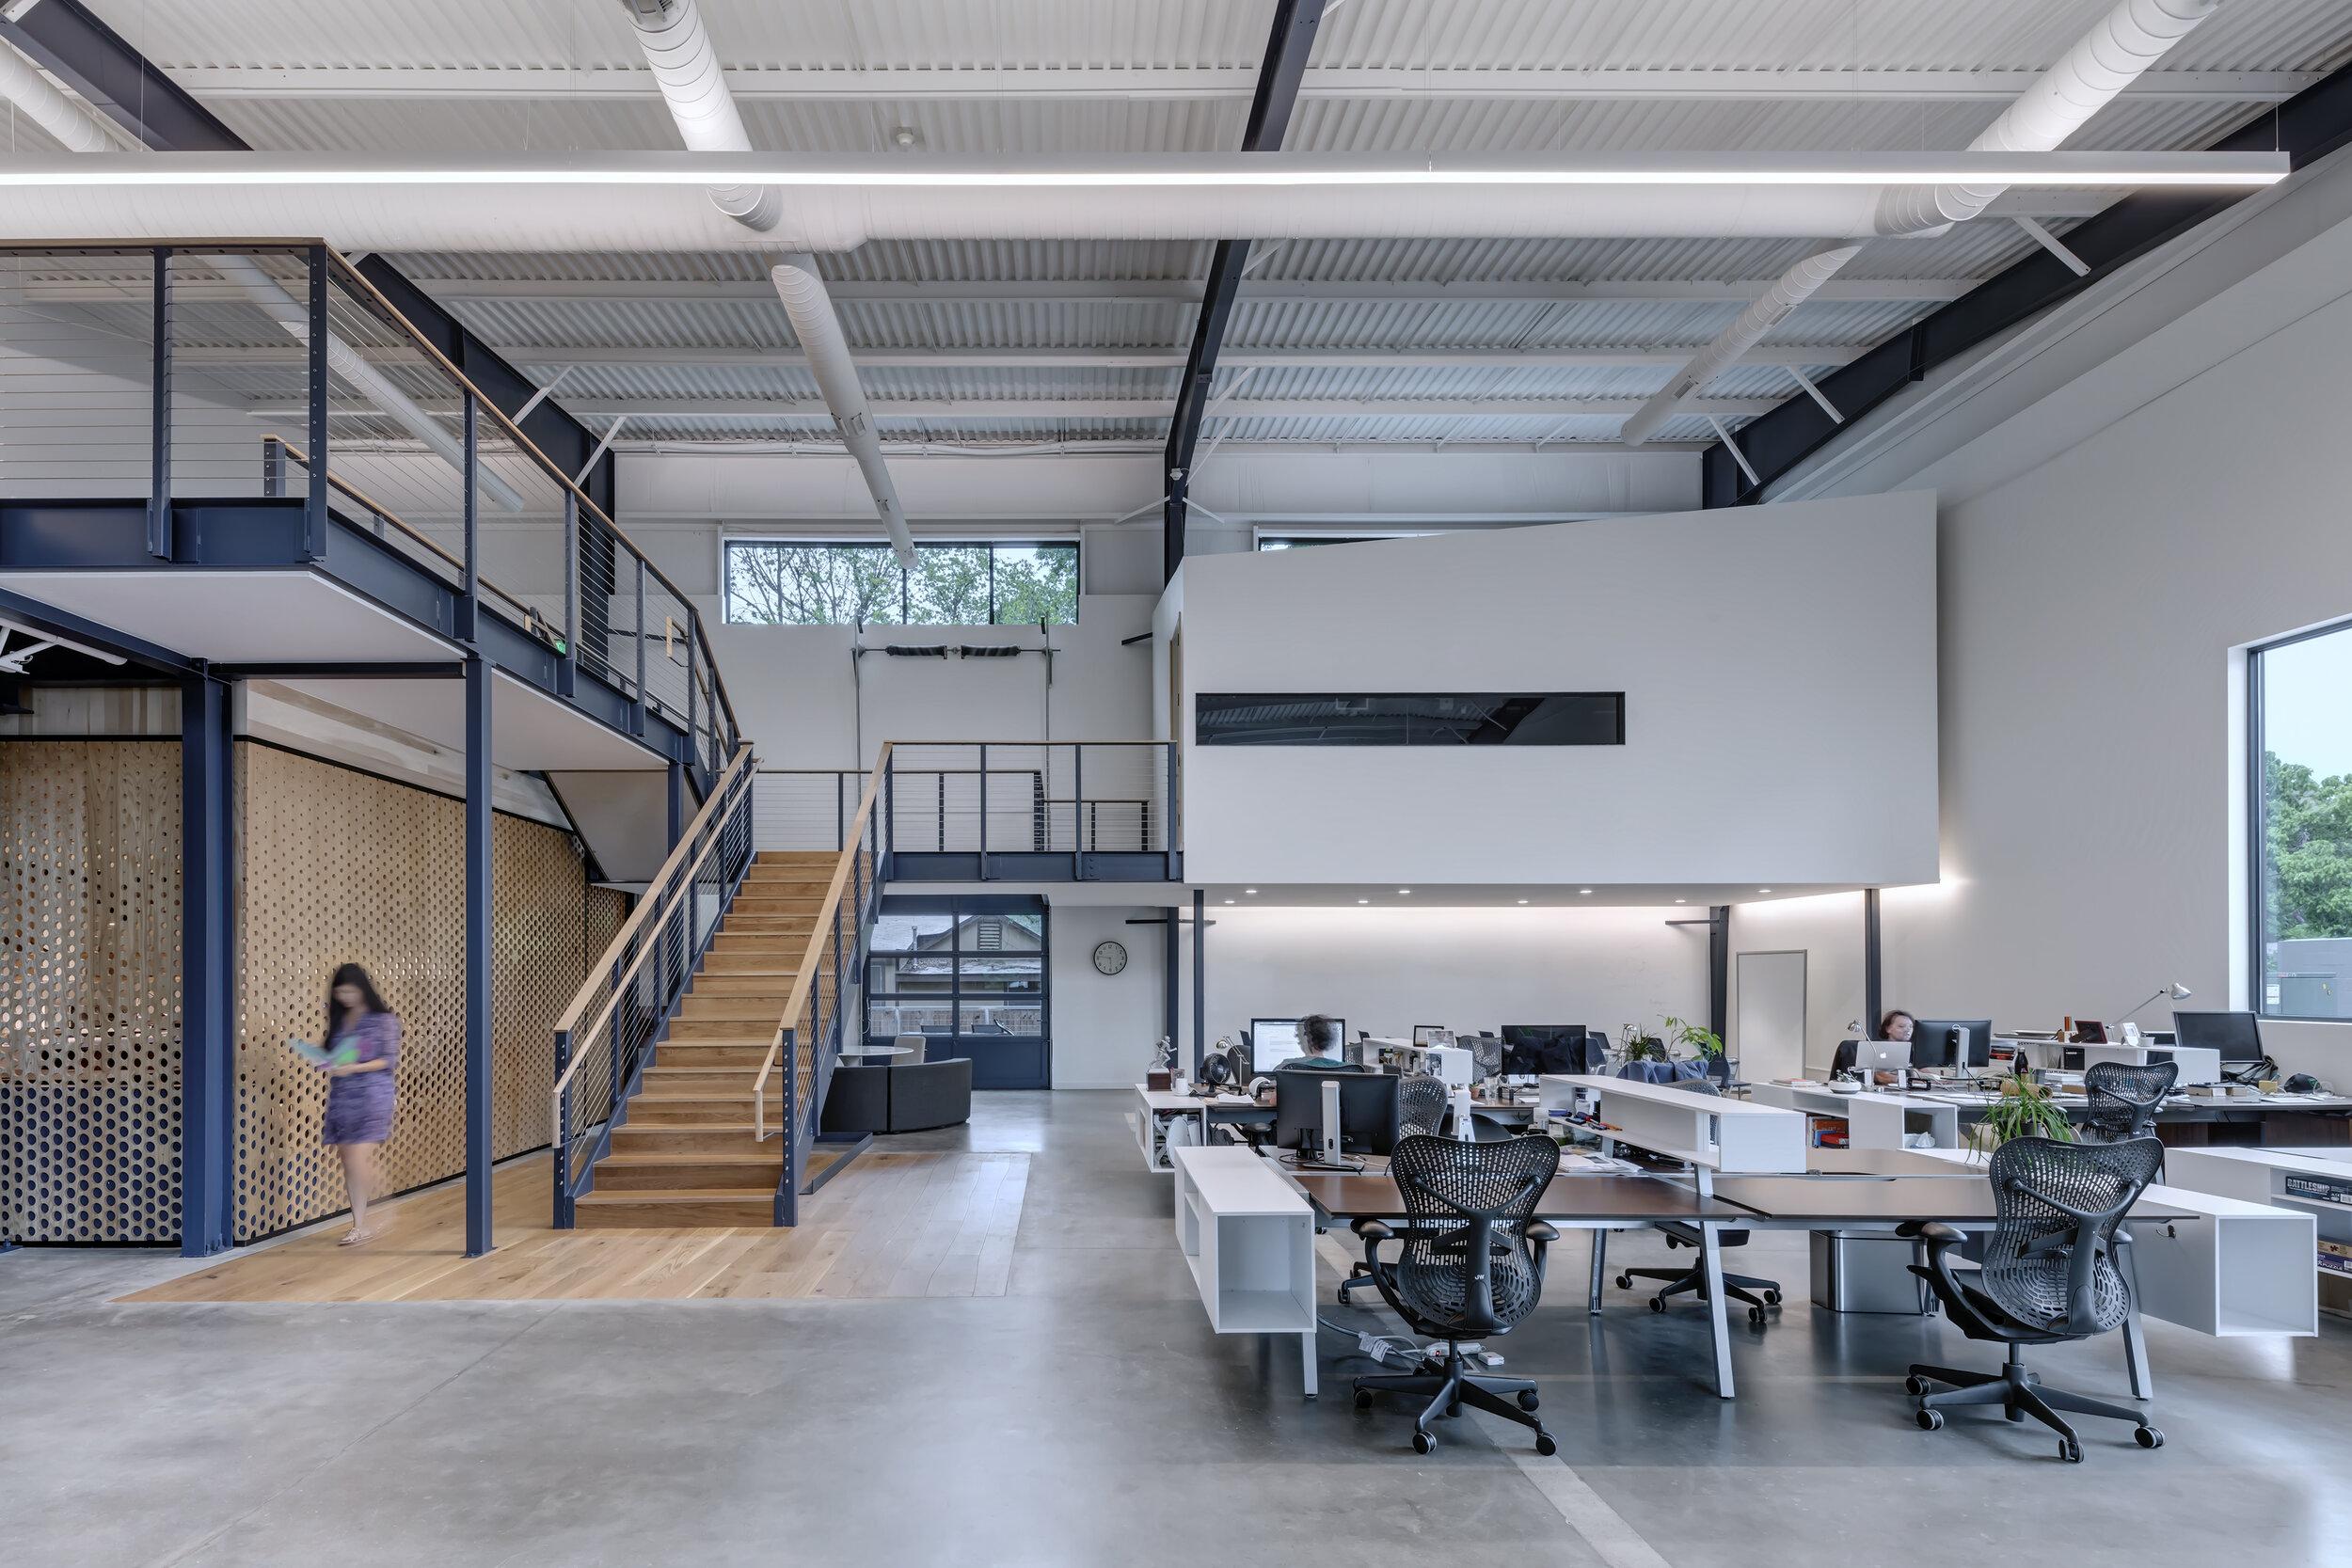 JDI Office by Matt Fajkus Architecture. Photo 1 by Charles Davis Smith.jpg